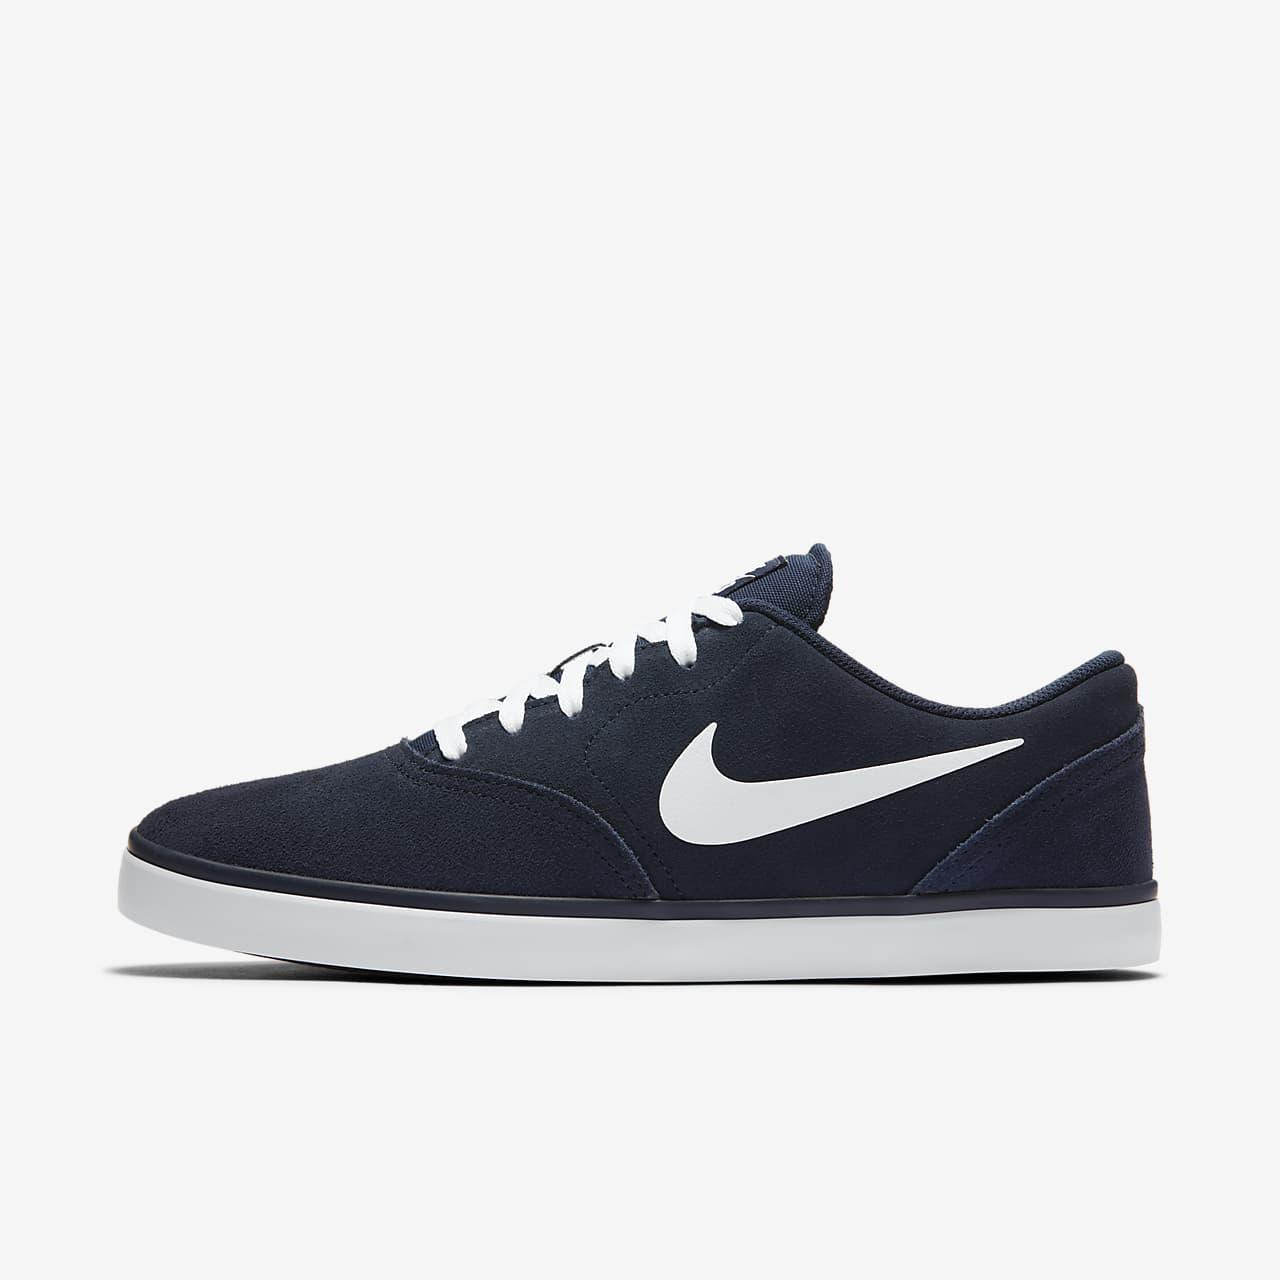 Chaussure de skateboard Nike SB Check